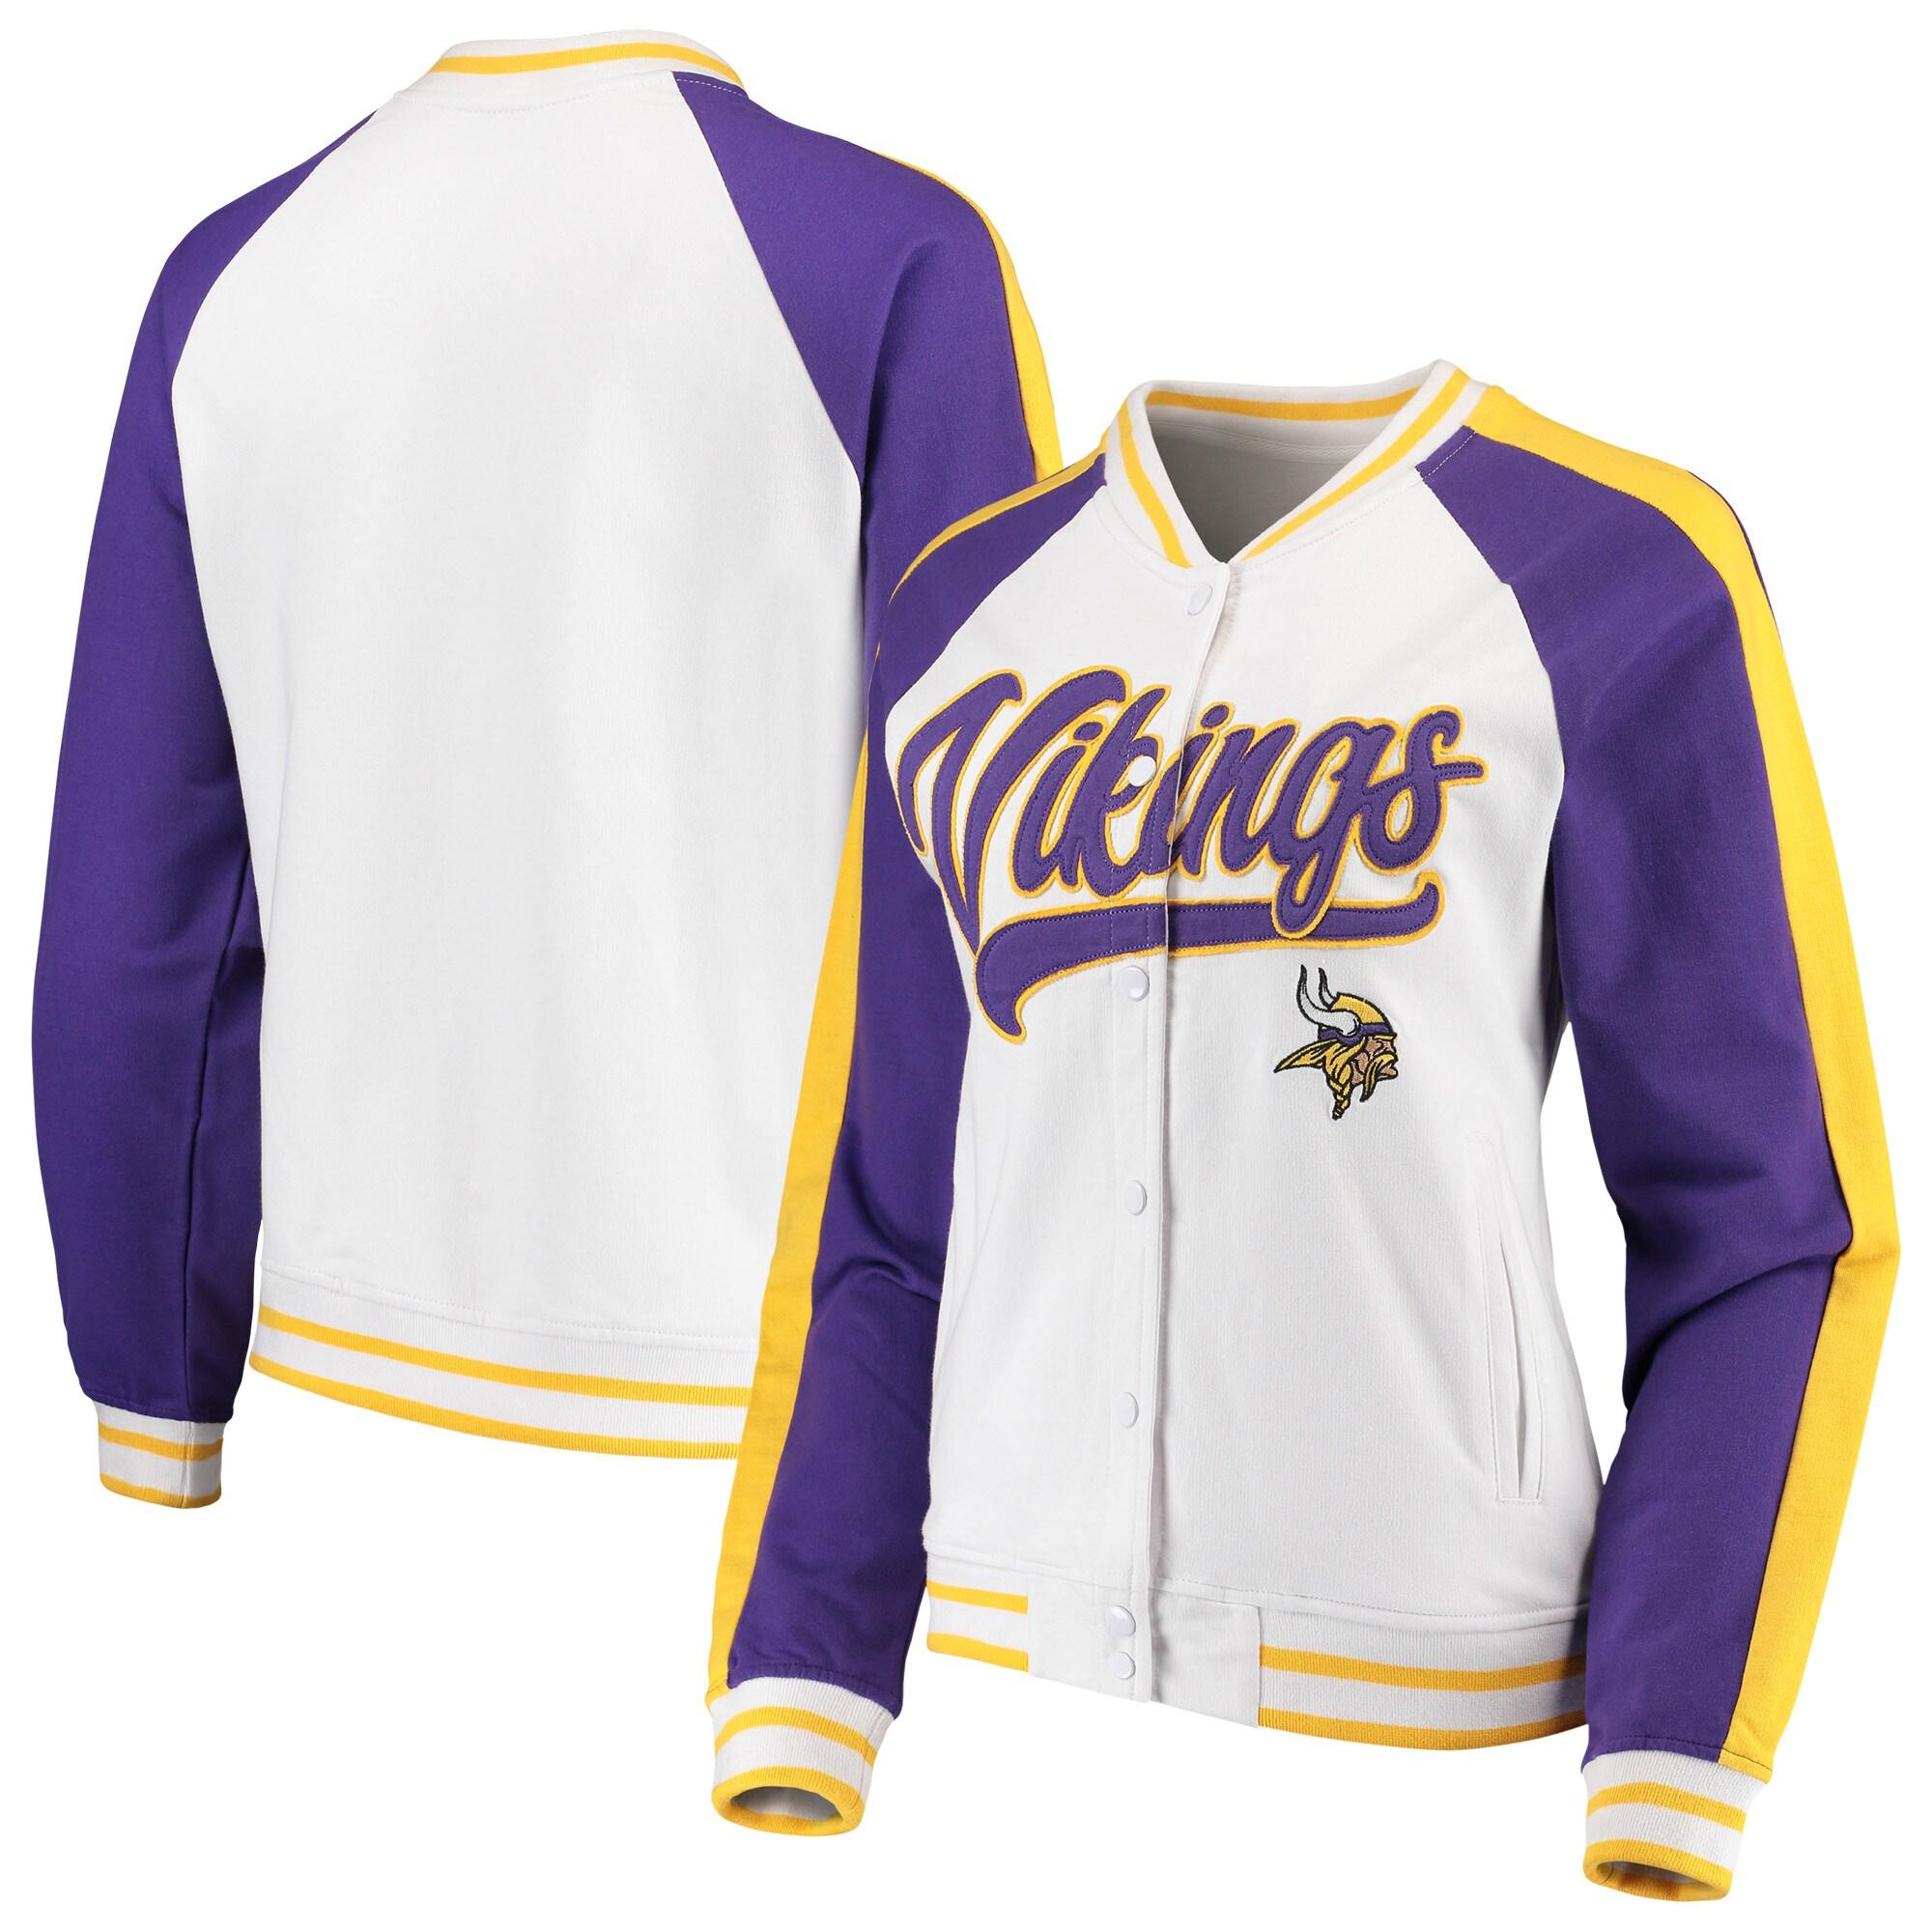 Minnesota Vikings New Era Women's Varsity Full Snap Jacket - White/Purple